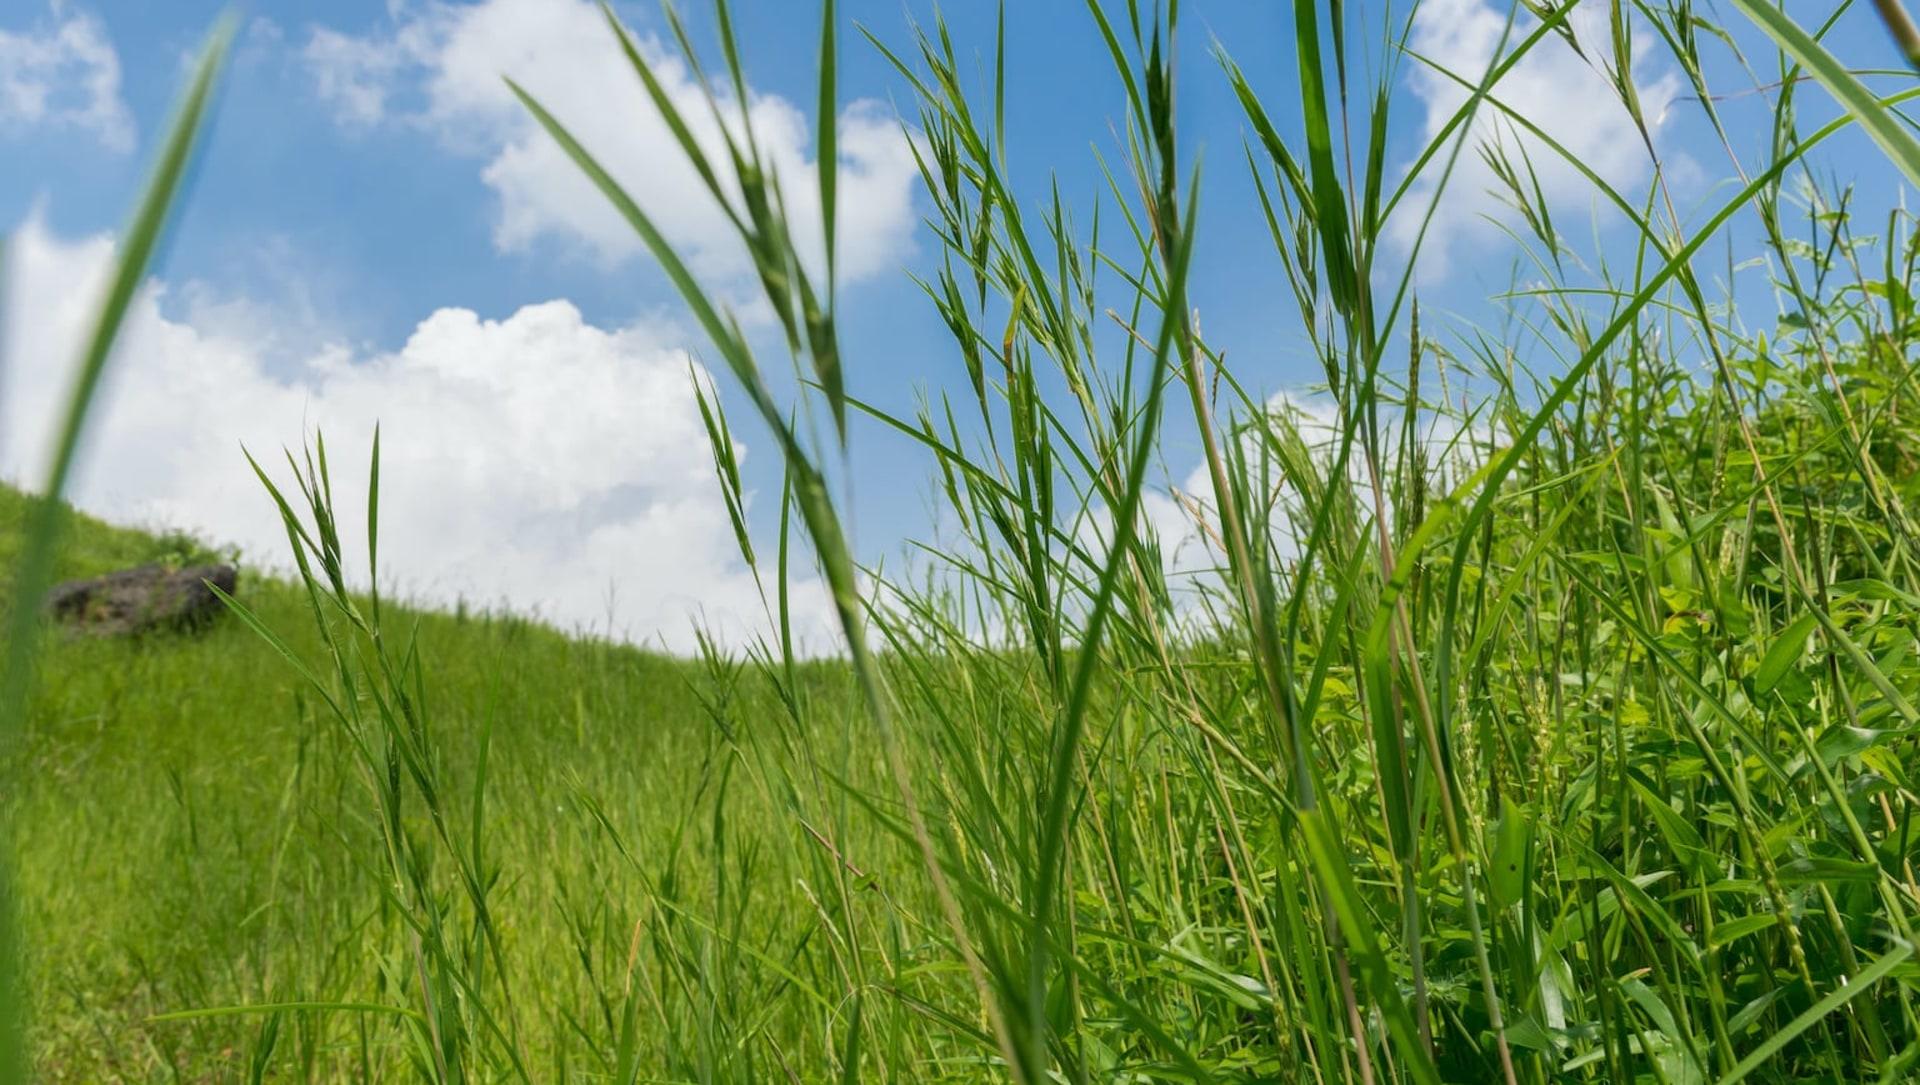 Droughts mitigated at Lamkani through grassland restoration